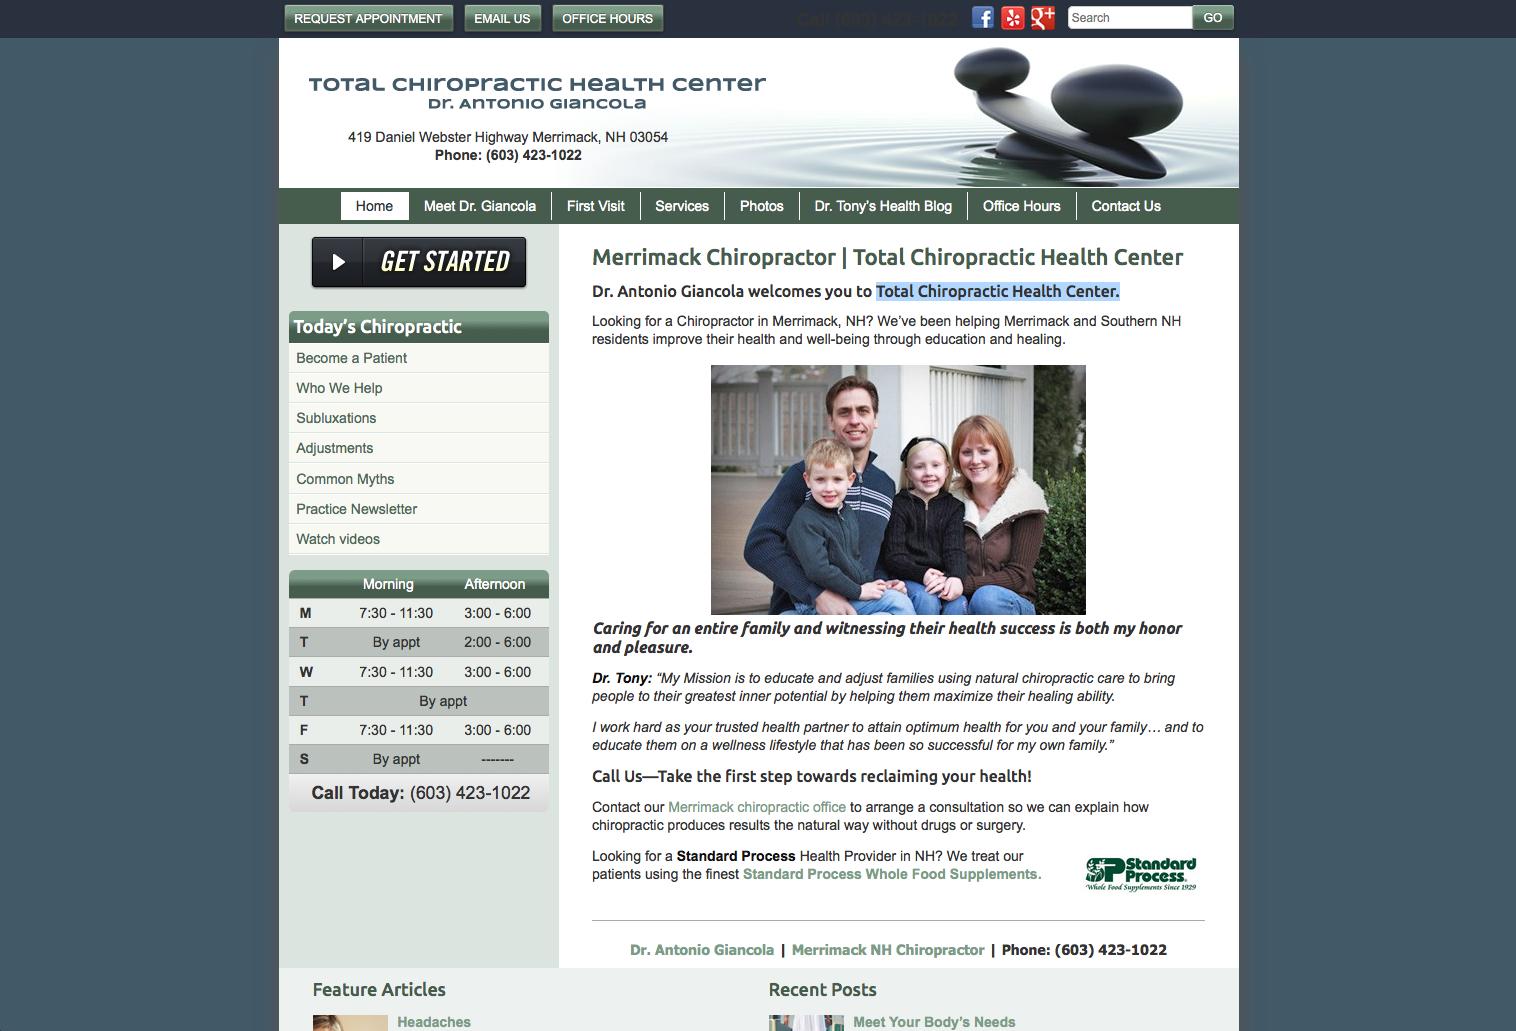 Total Chiropractic Health Center